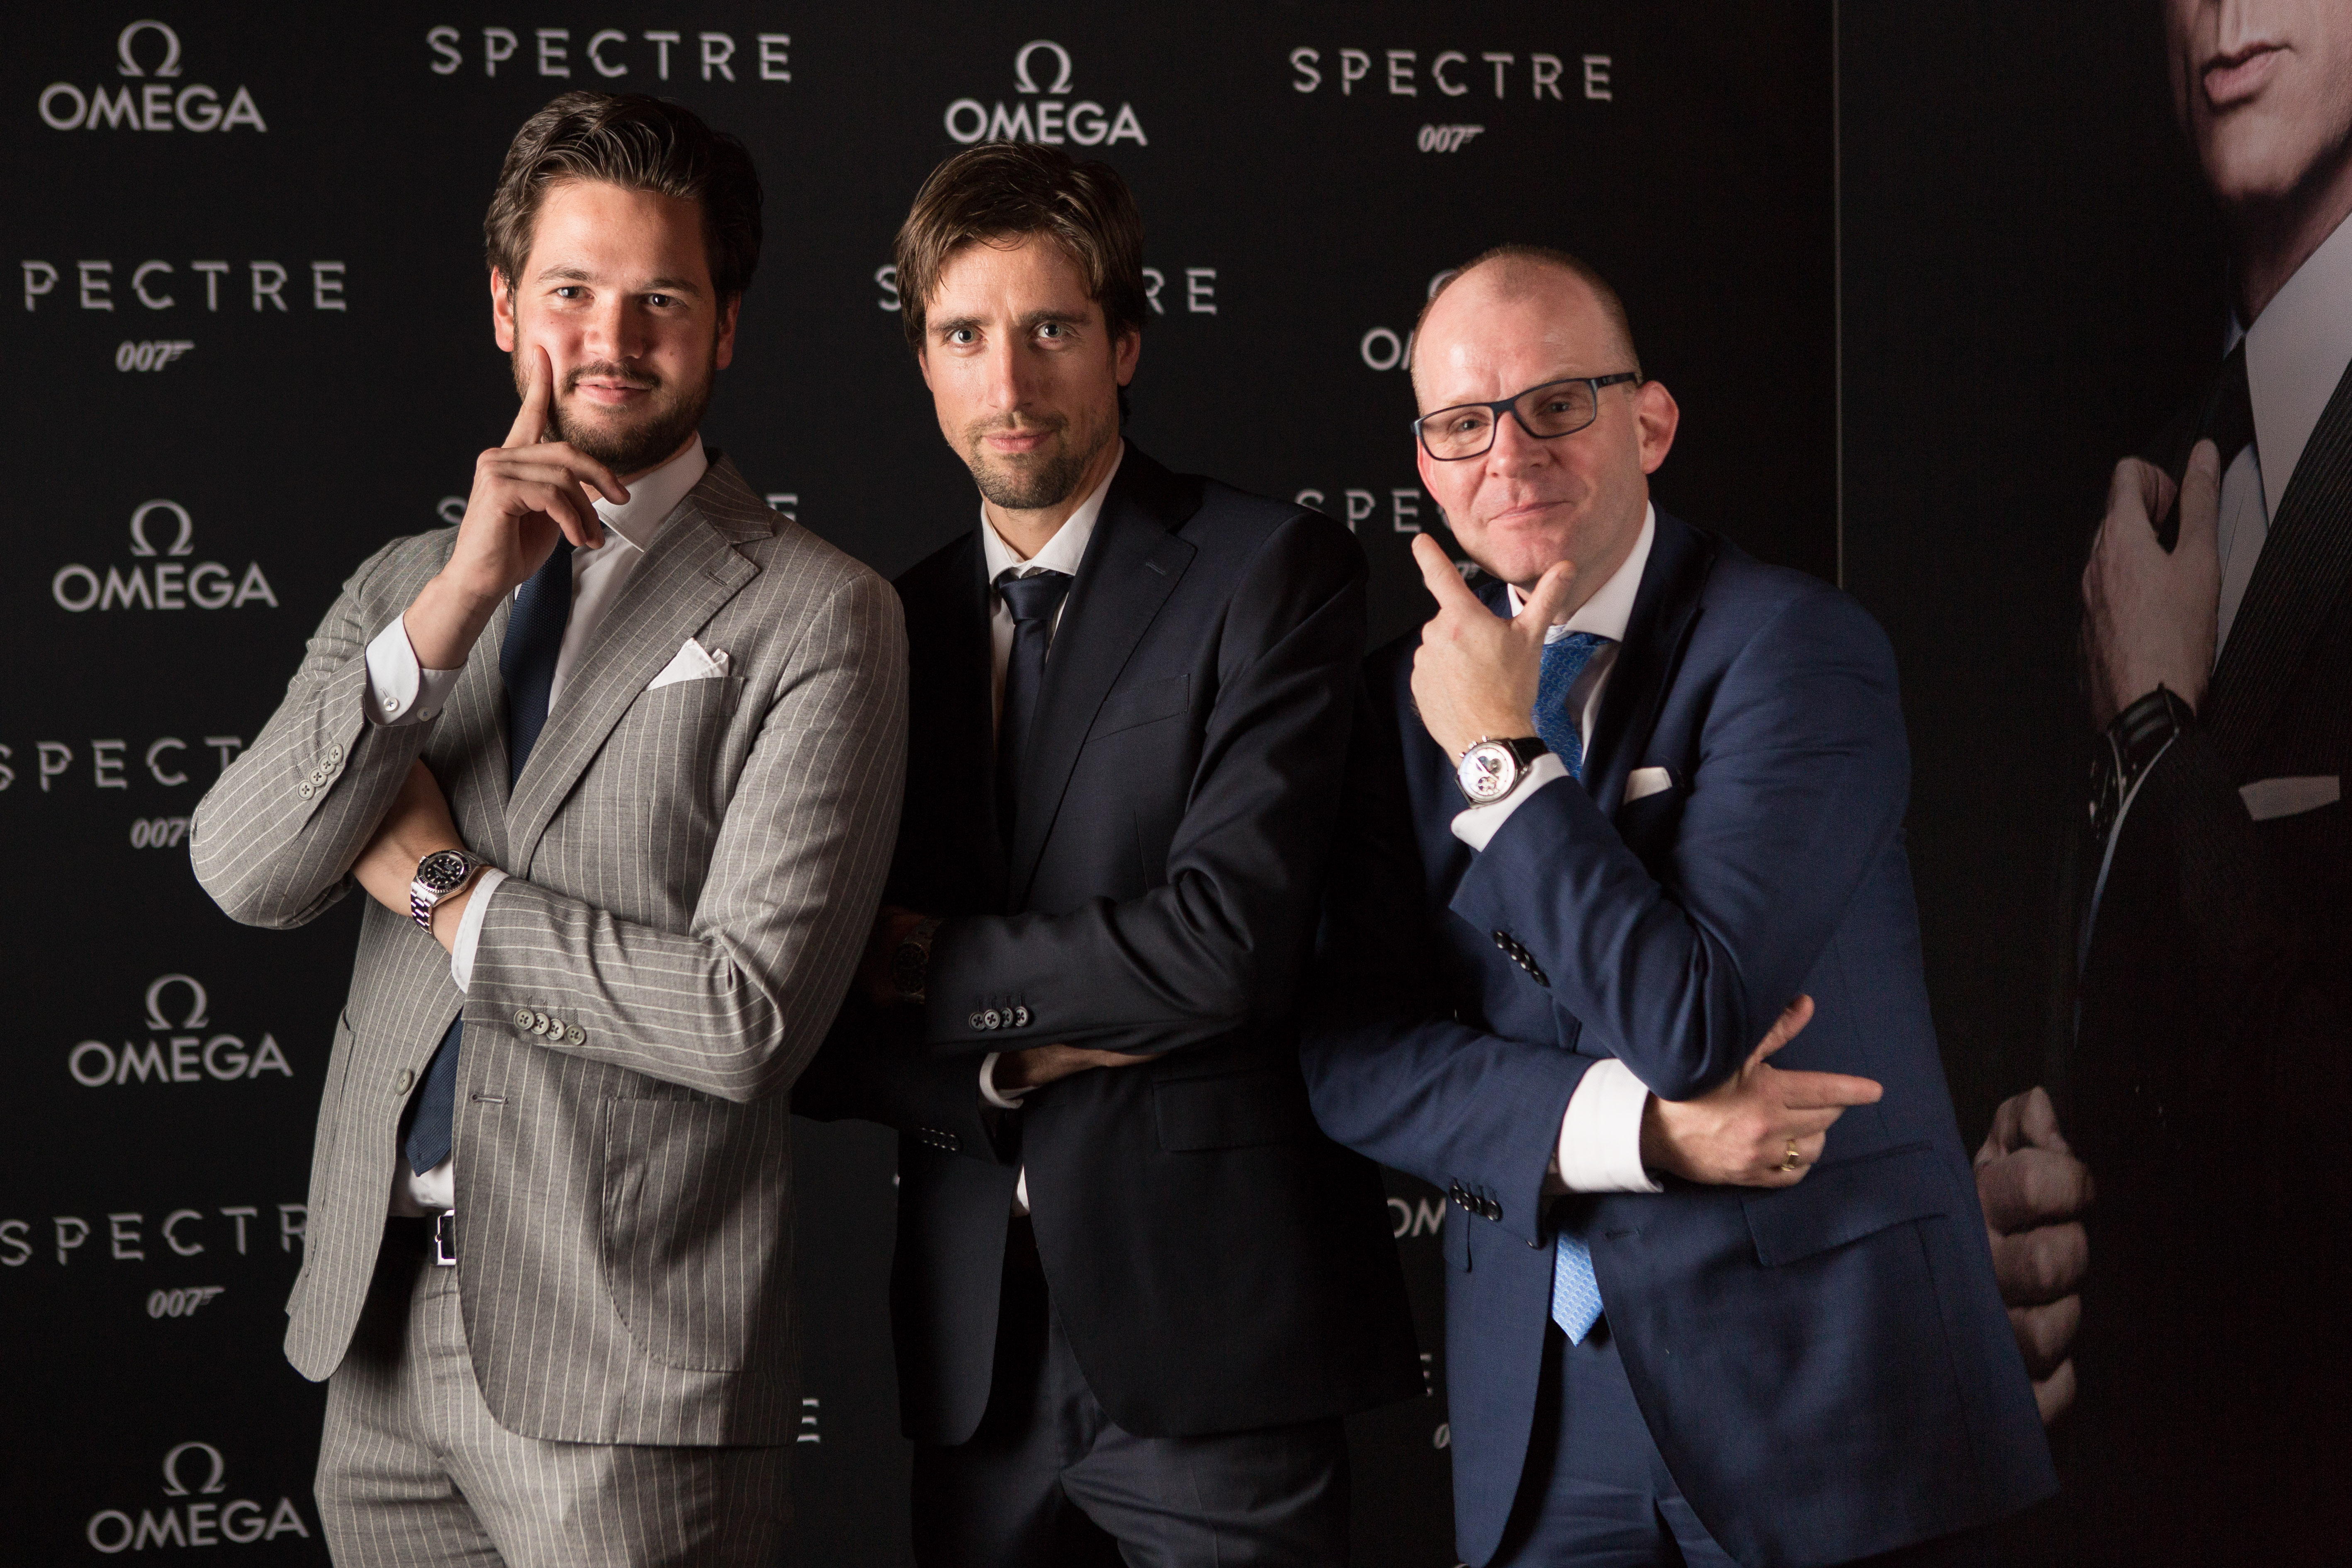 spectre-omega wall-40